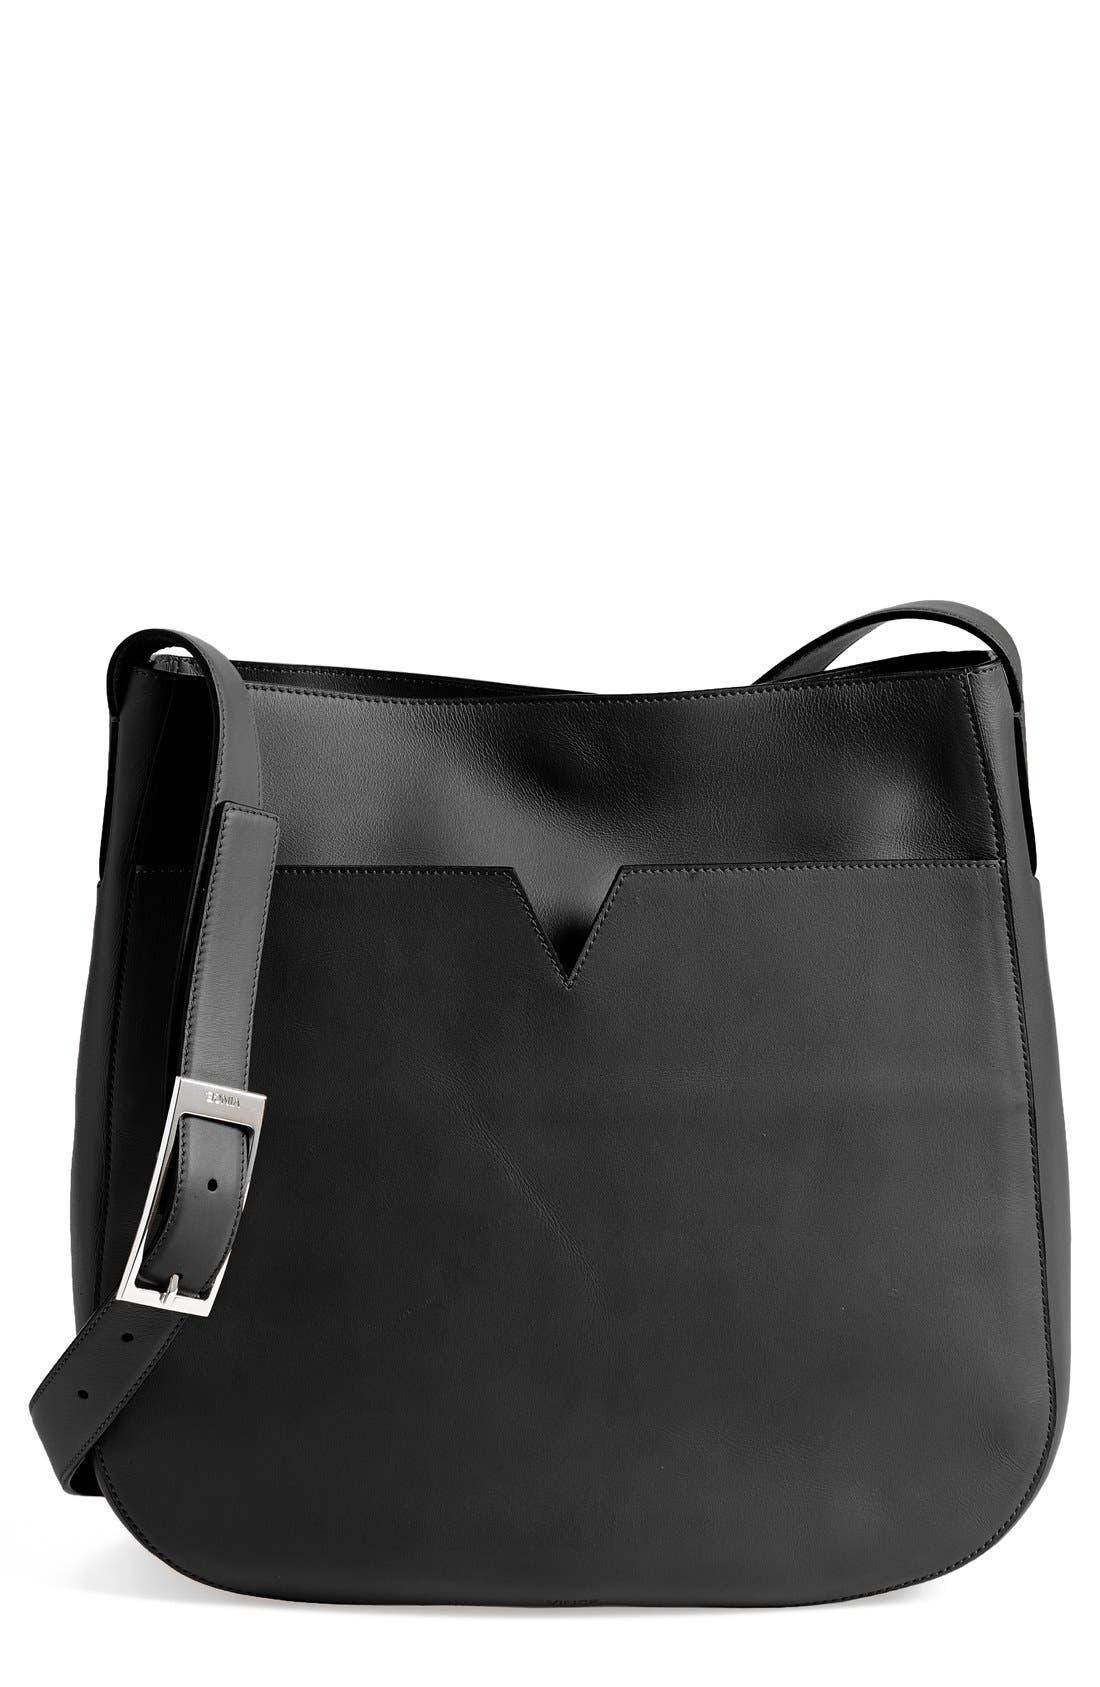 VINCE,                             'Medium' Leather Crossbody Bag,                             Main thumbnail 1, color,                             001